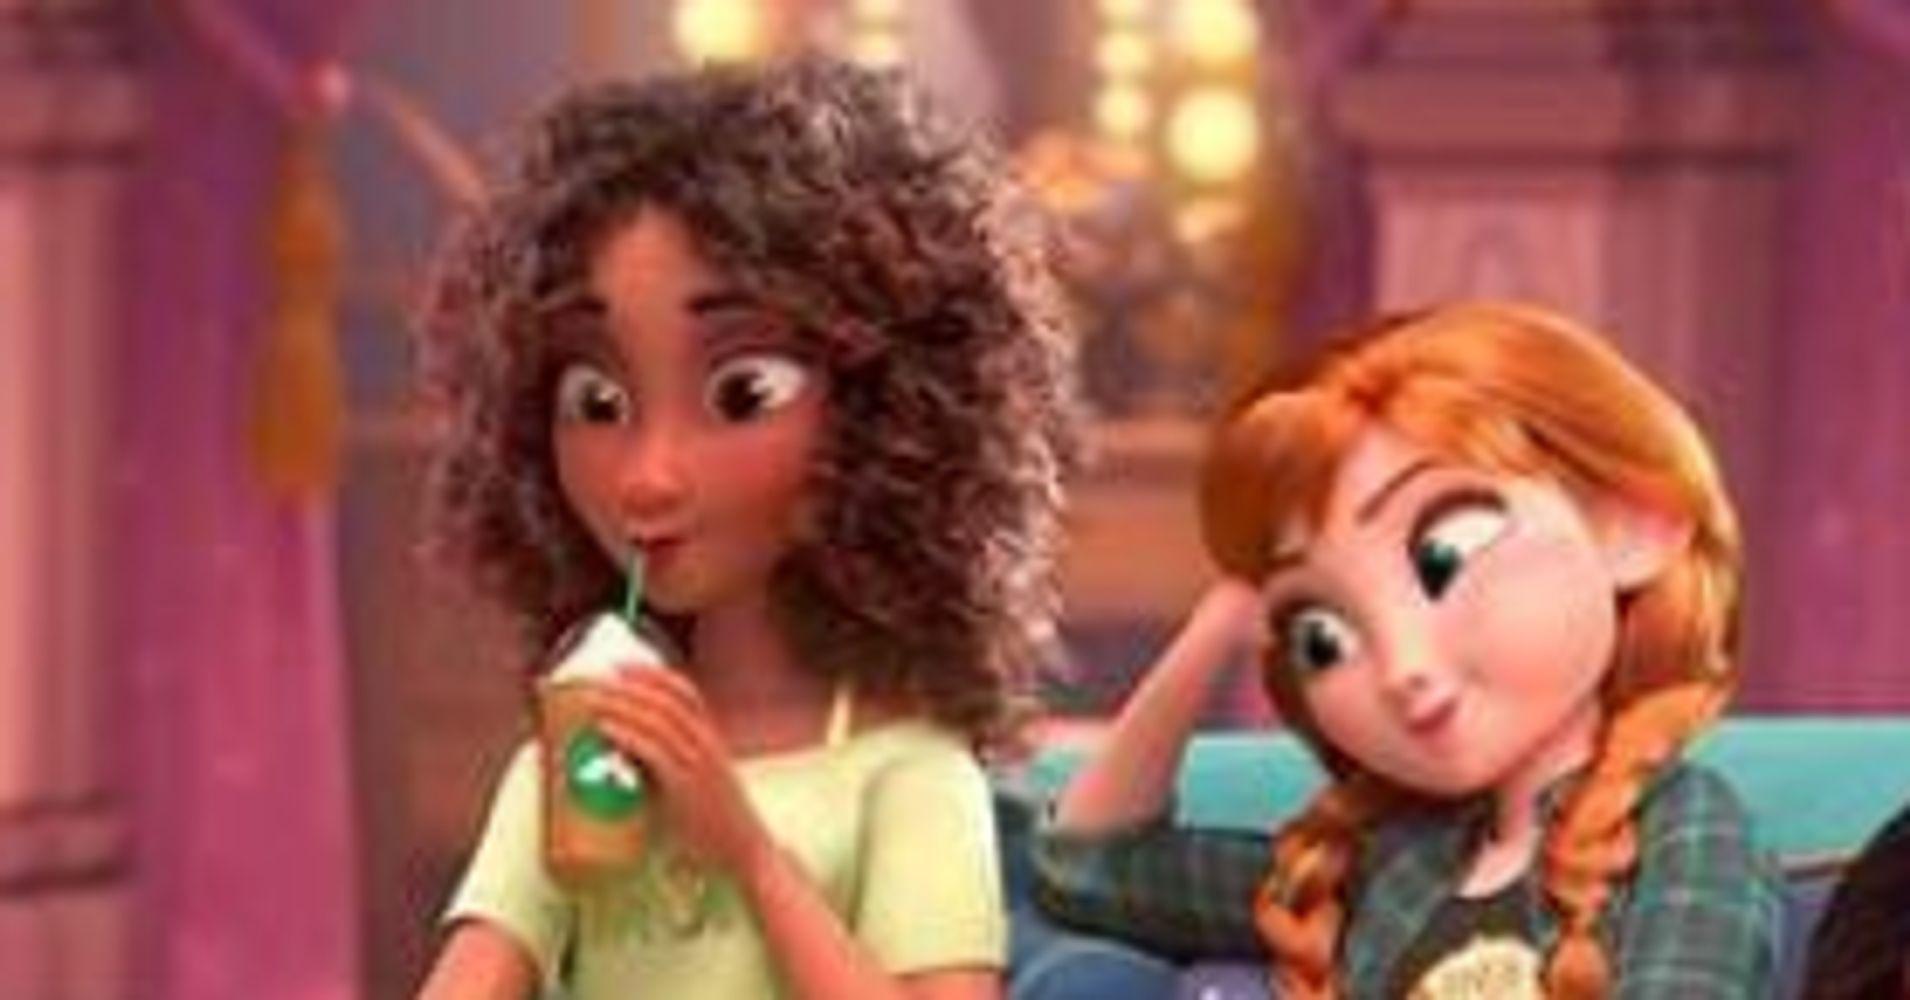 Disney accused of lightening princess tianas skin tone in wreck it disney accused of lightening princess tianas skin tone in wreck it ralph sequel huffpost altavistaventures Gallery